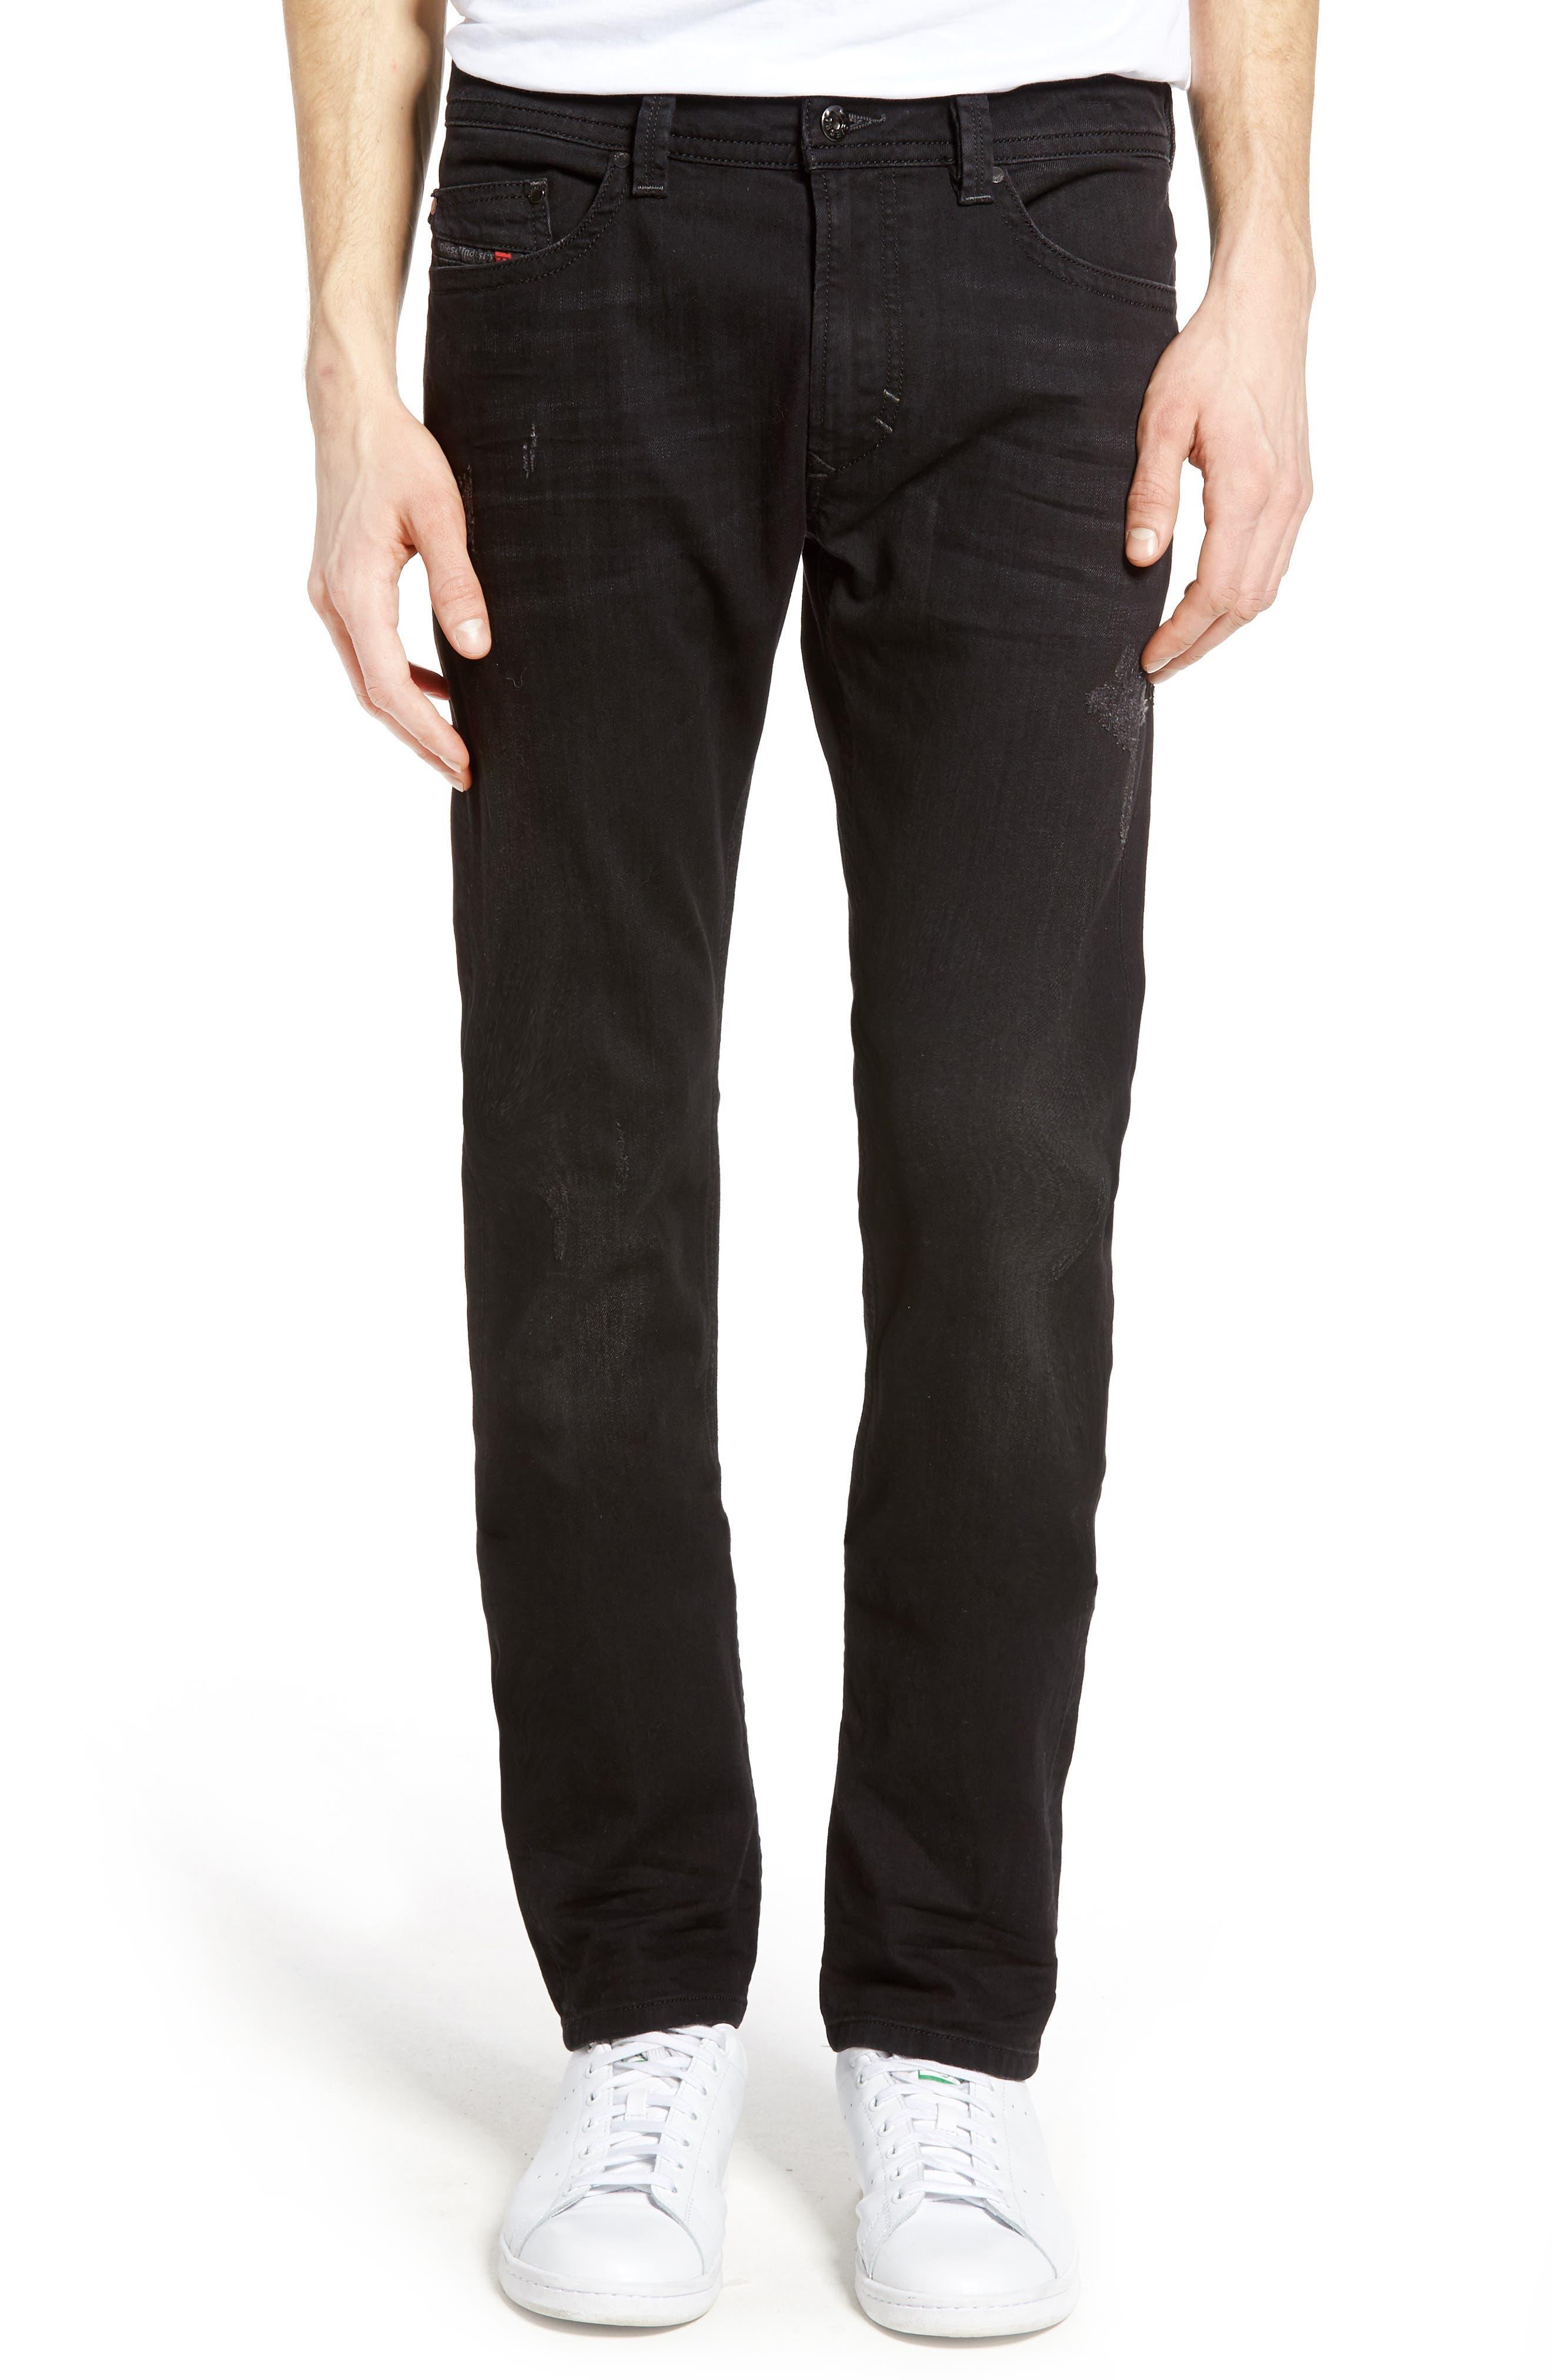 Thavar Skinny Fit Jeans,                         Main,                         color, 008